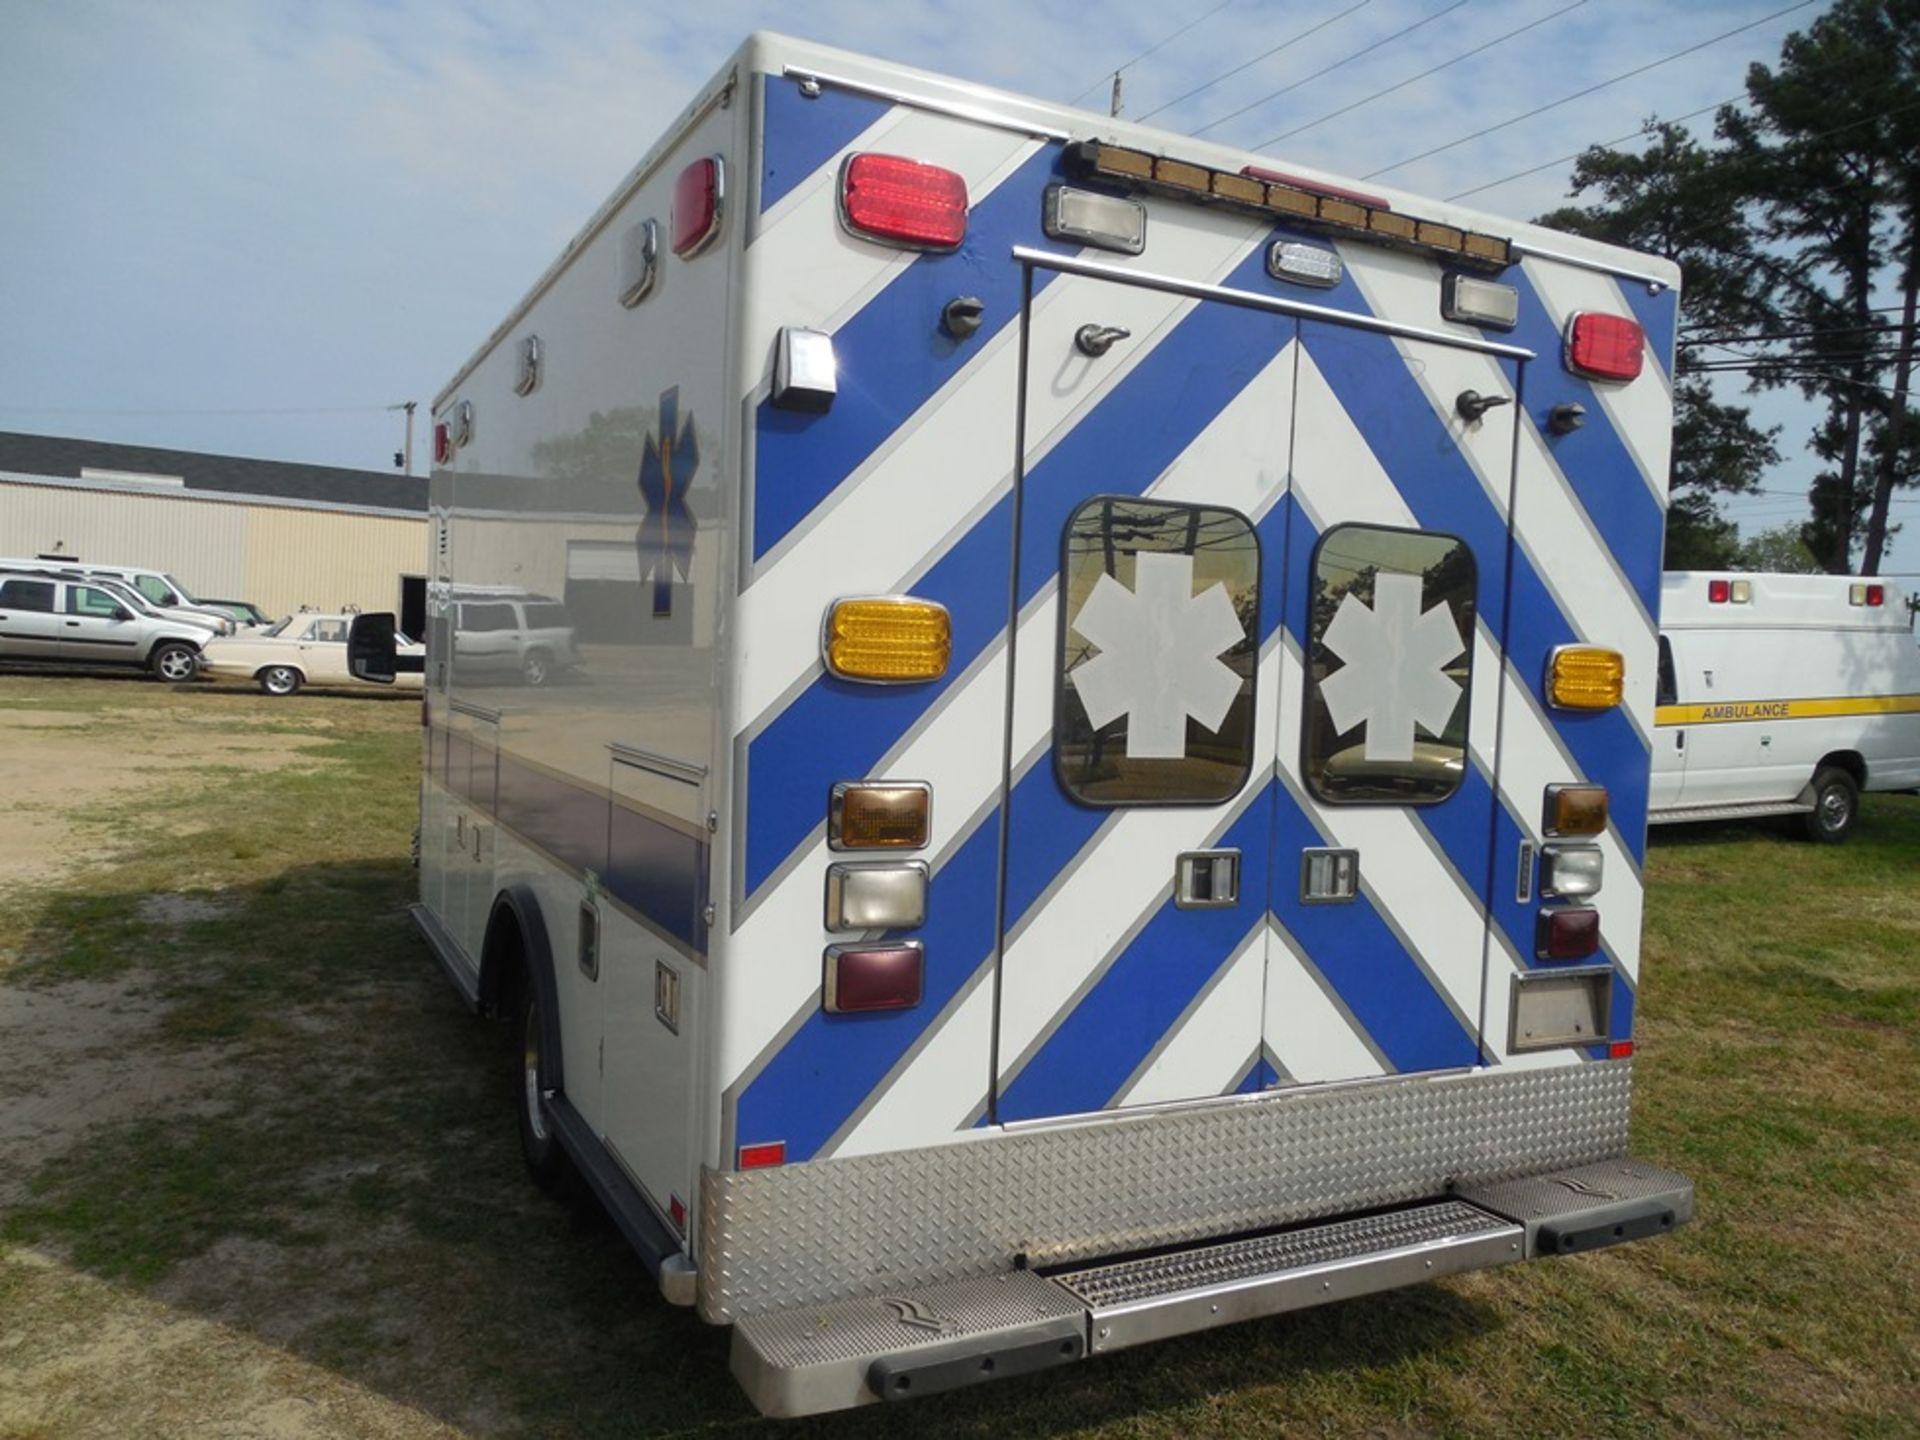 2010 Chev 4500 dsl box ambulance 258,589 miles, vin# 1GB9G5B6XA1132748 - Image 5 of 6